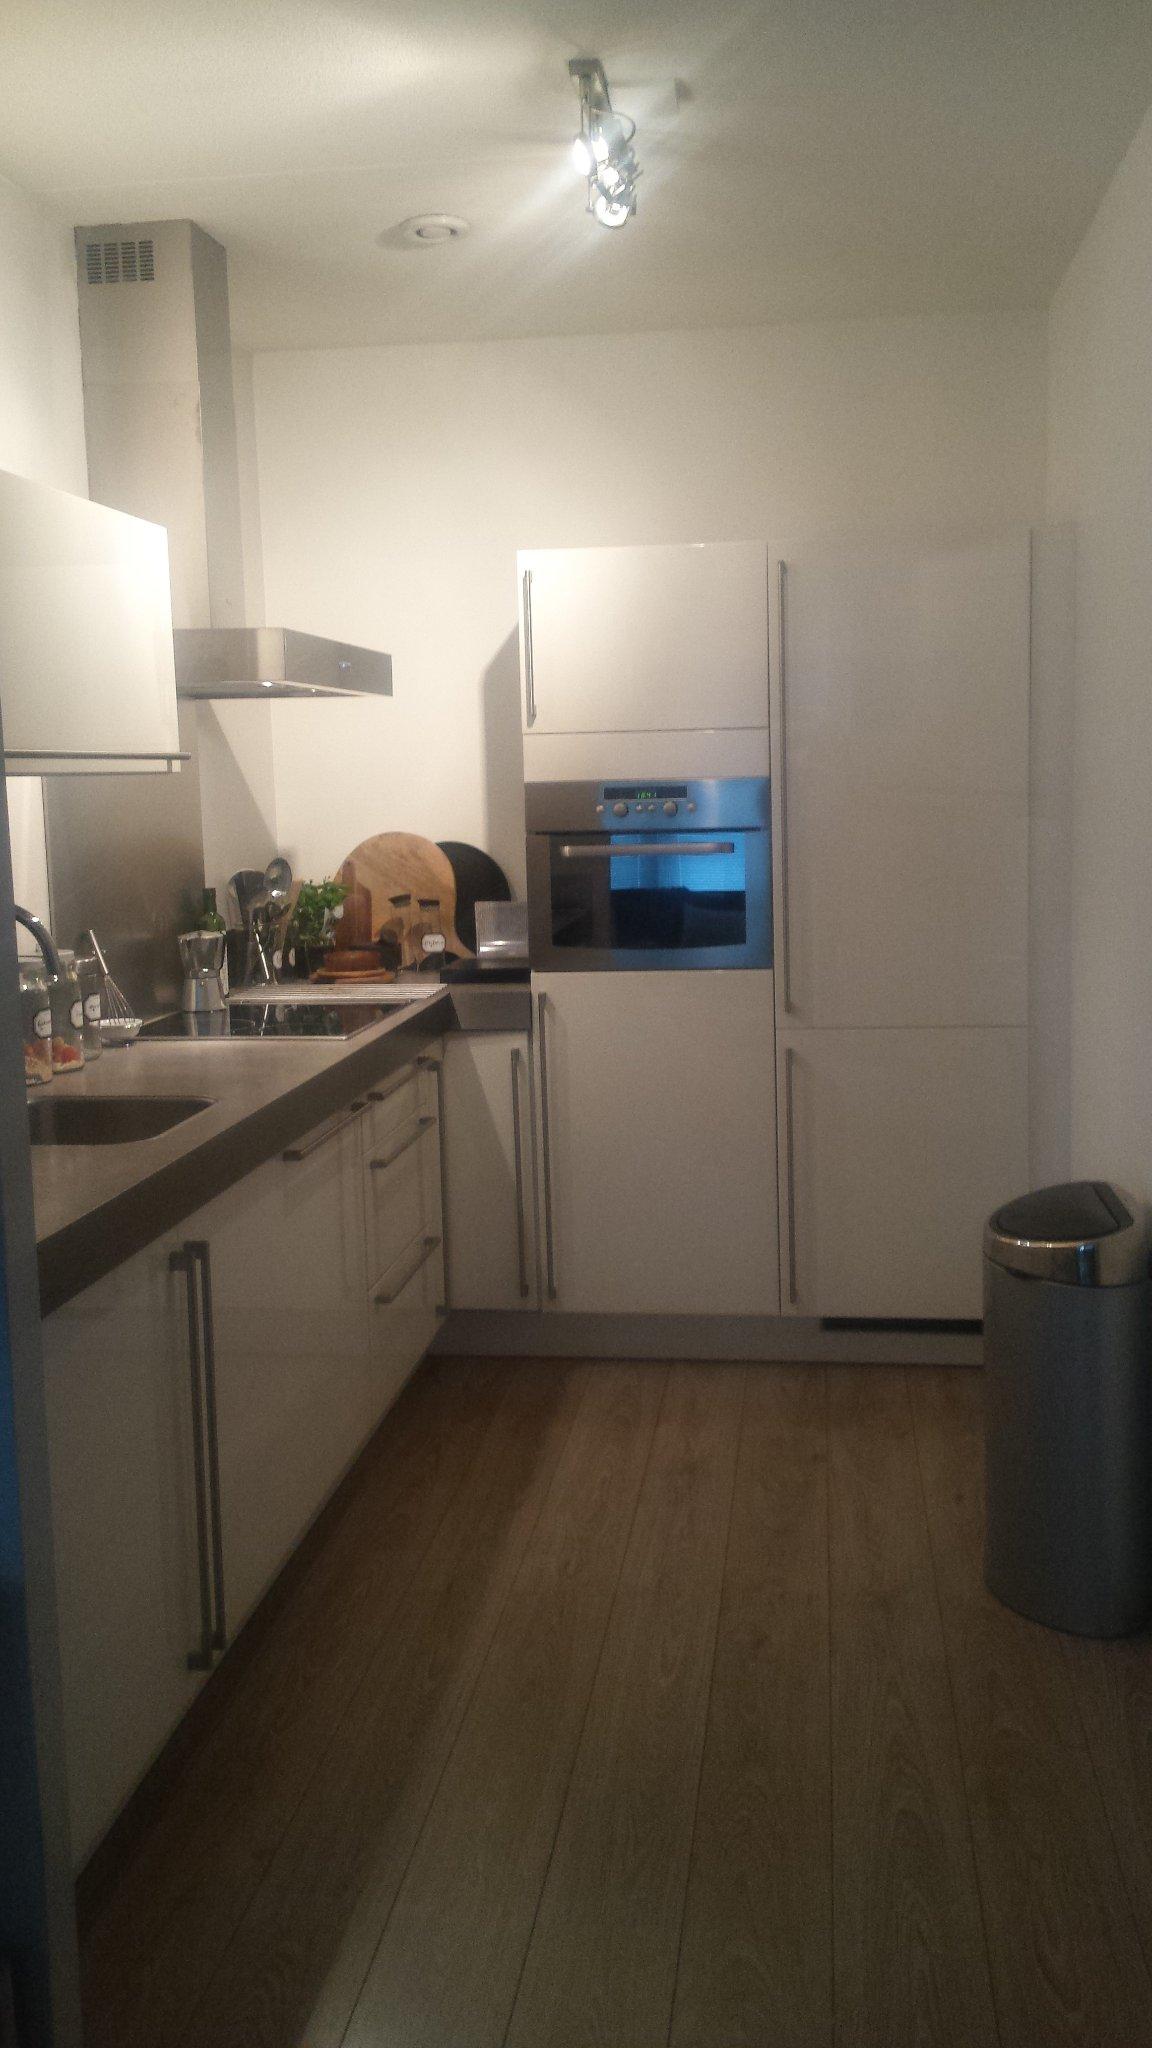 carrousel keuken afstellen : Keukenlade Afstellen Metod Maximera Onderkast Met Lade Deur